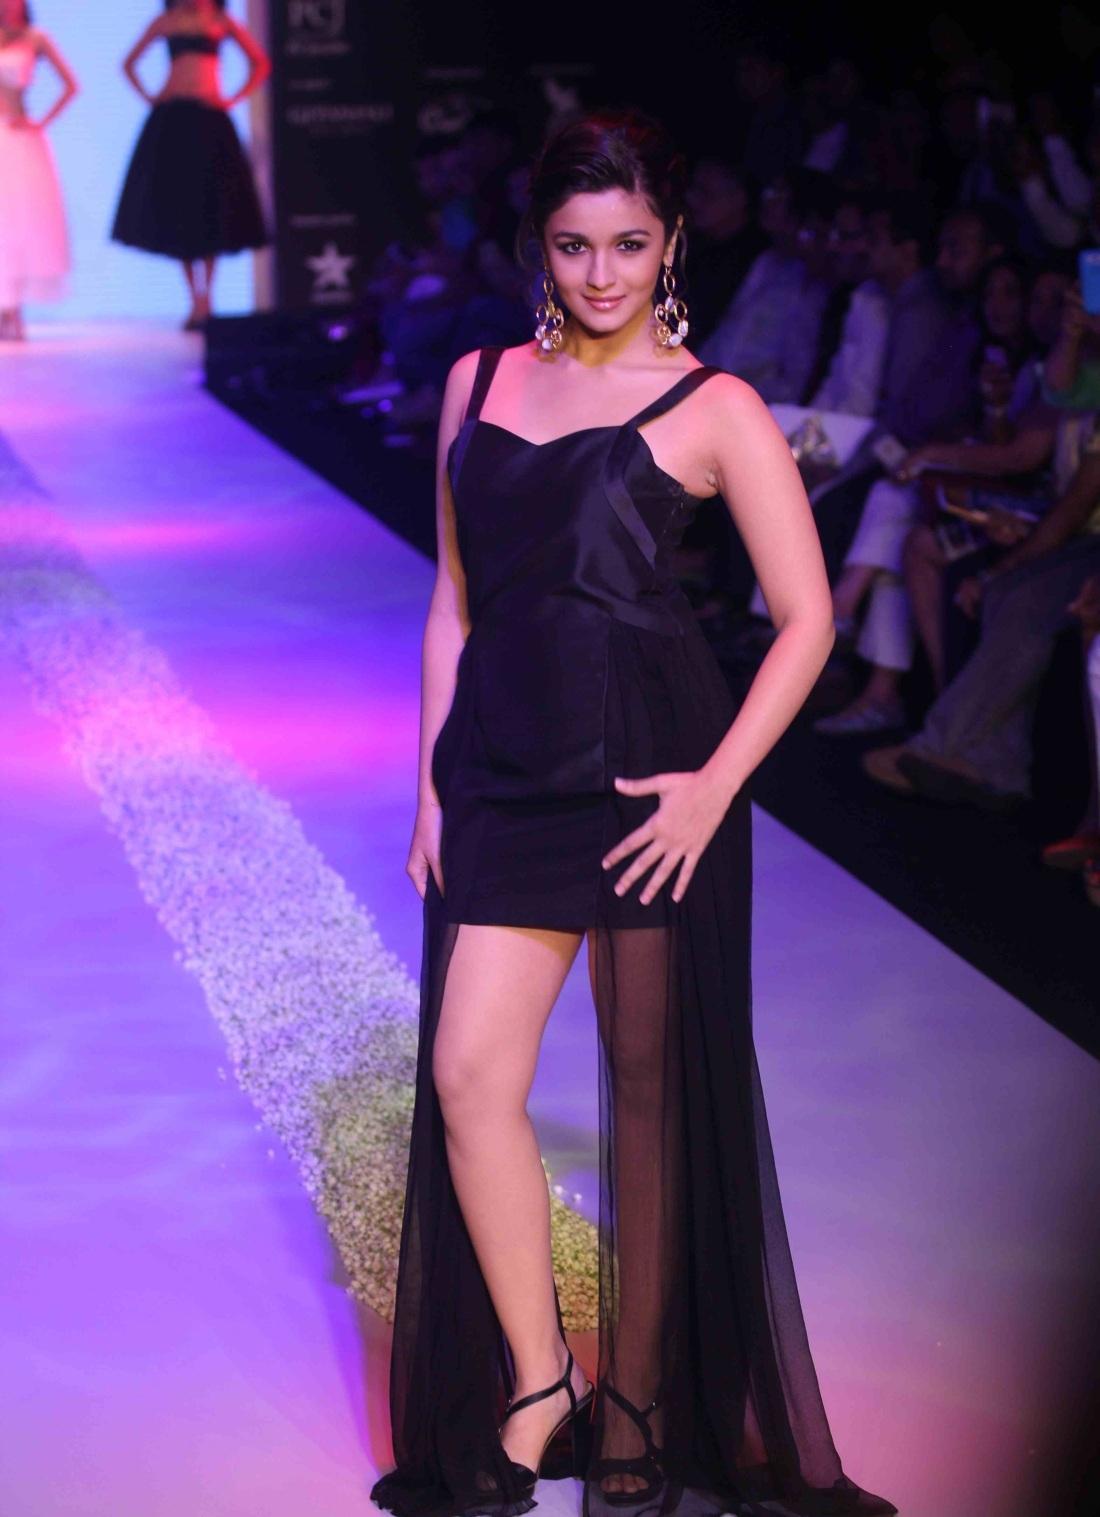 Alia Bhatt Hot In Black Legs Show - Boobs Touch-6137